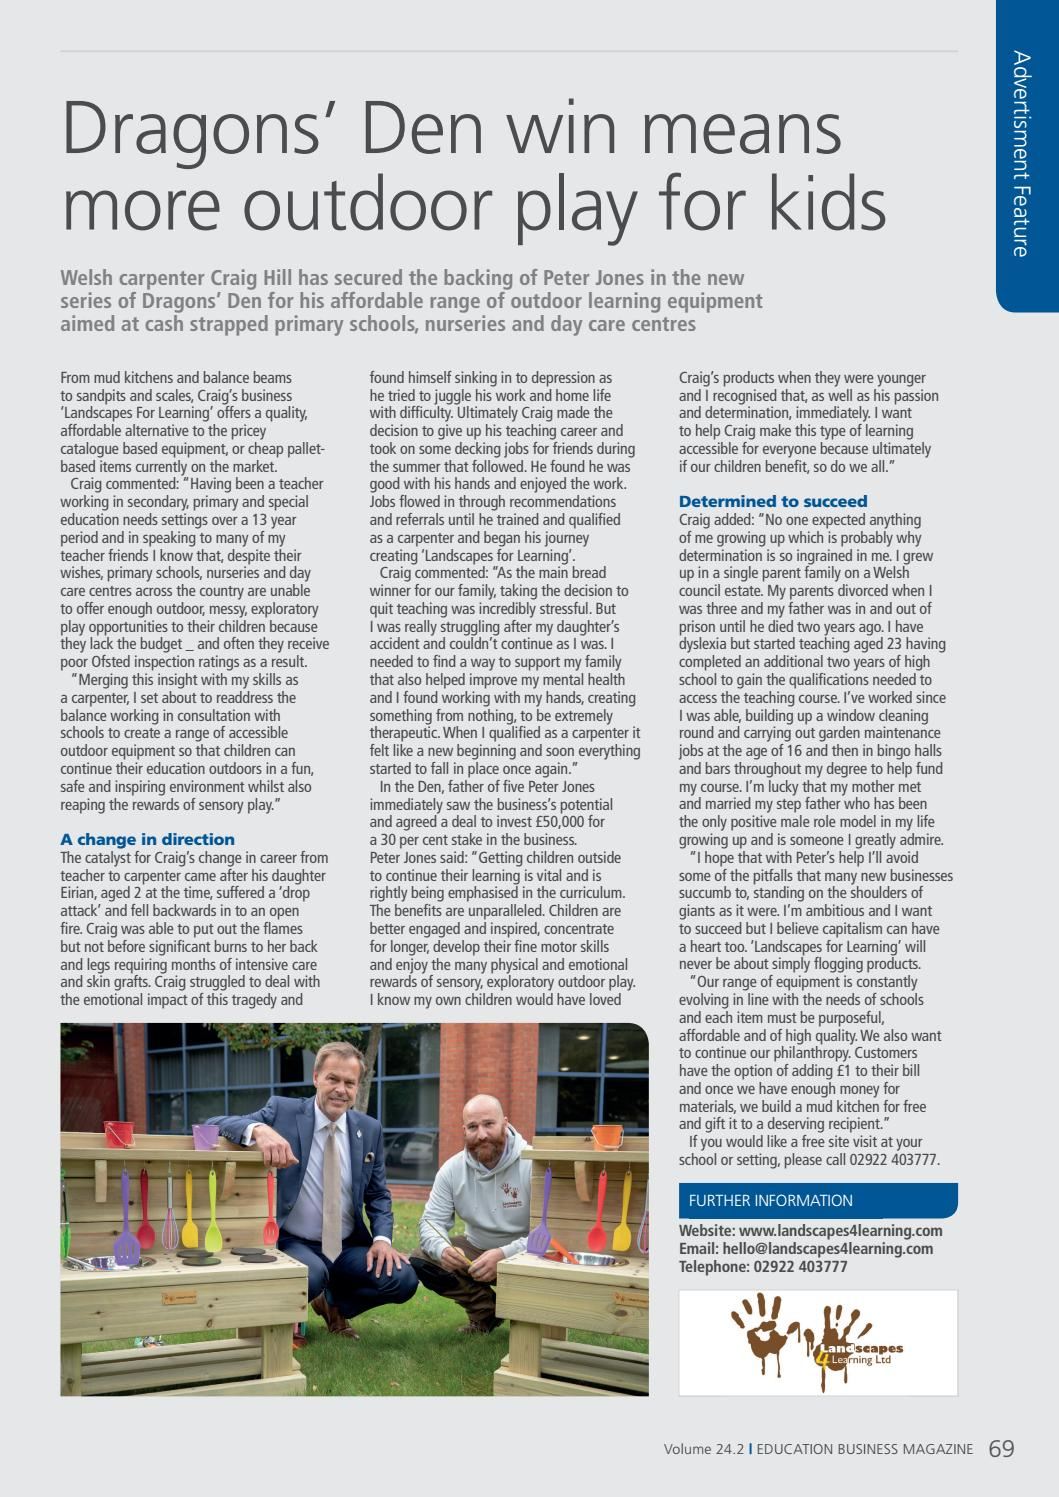 Education Business Magazine 24 2 By Psi Media Issuu